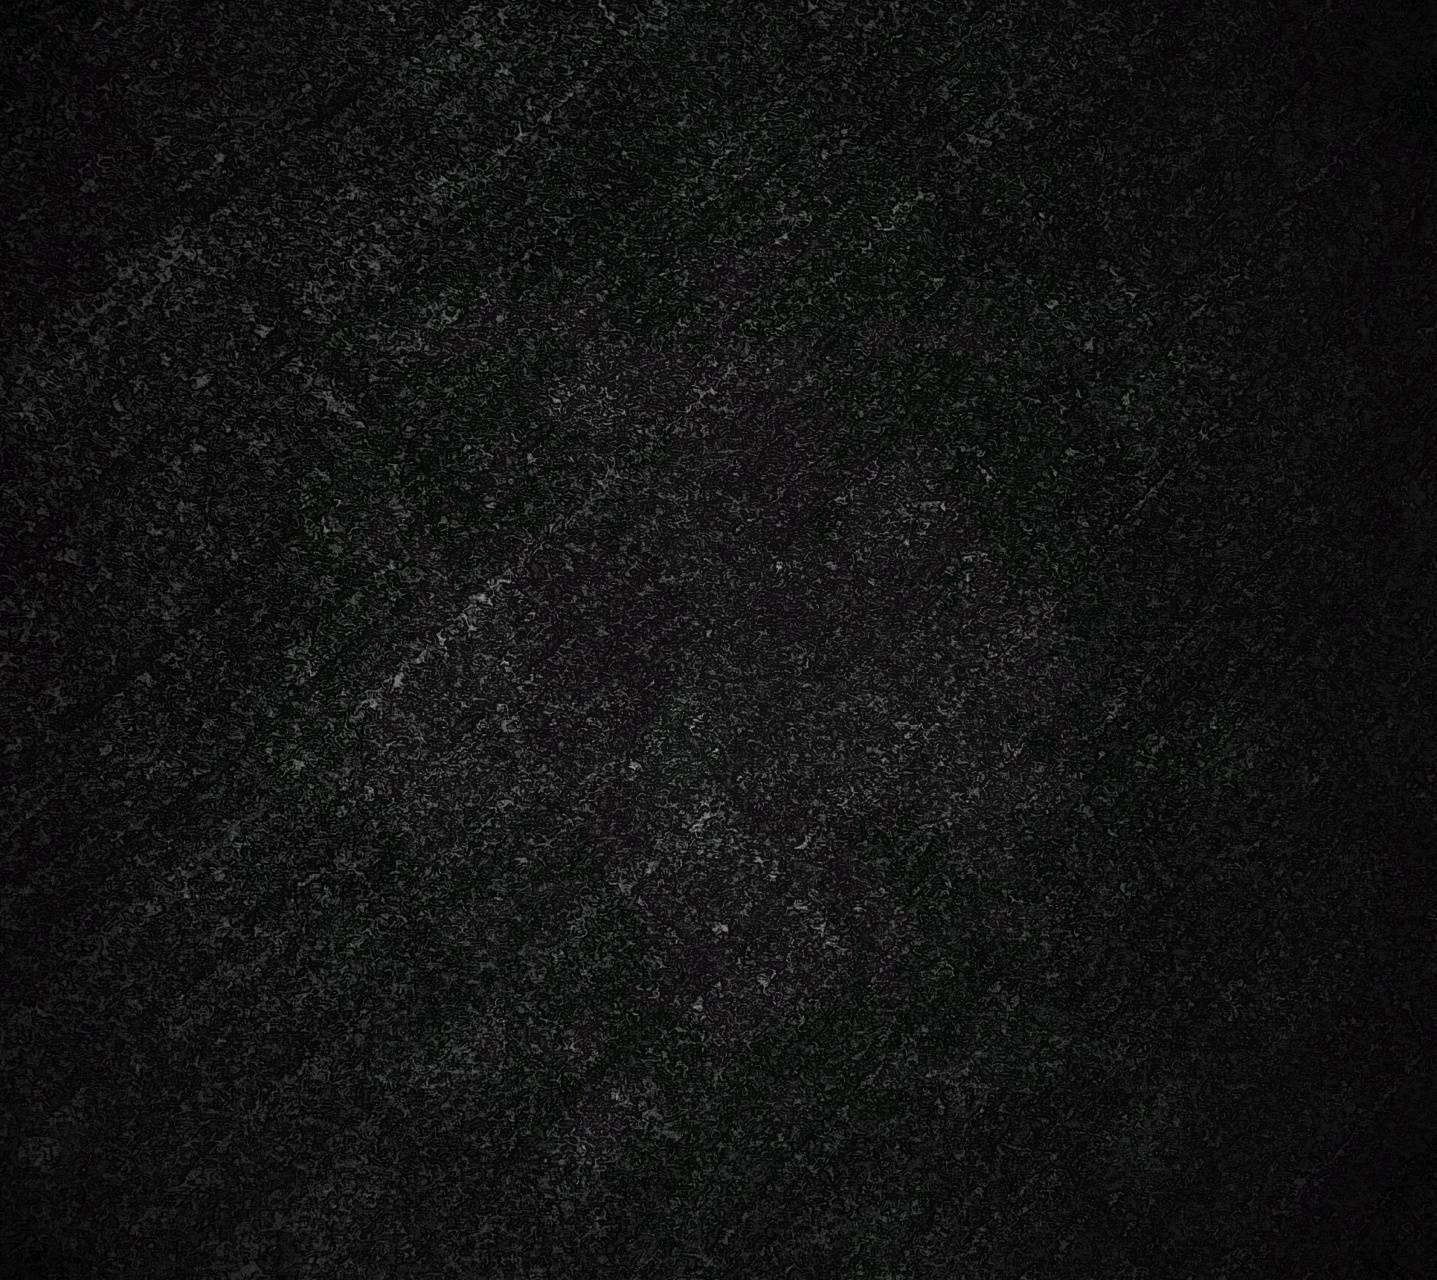 Blacknet